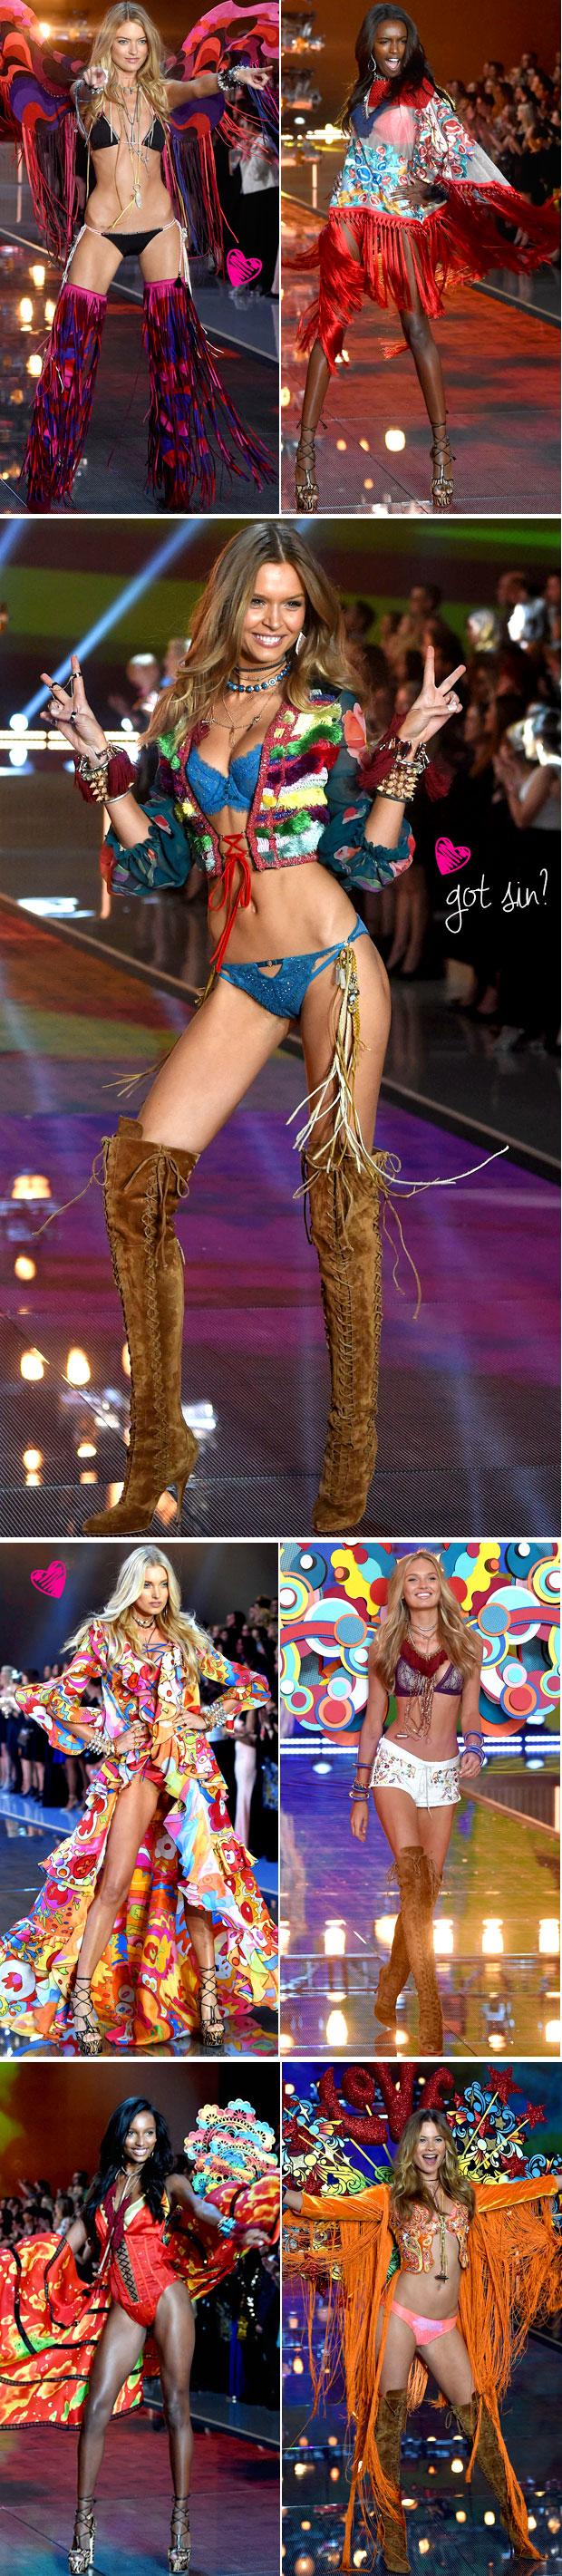 victorias-secret-fashion-show-todas-as-fotos-blog-got-sin-60s-boho-angels-behati-prinsloo